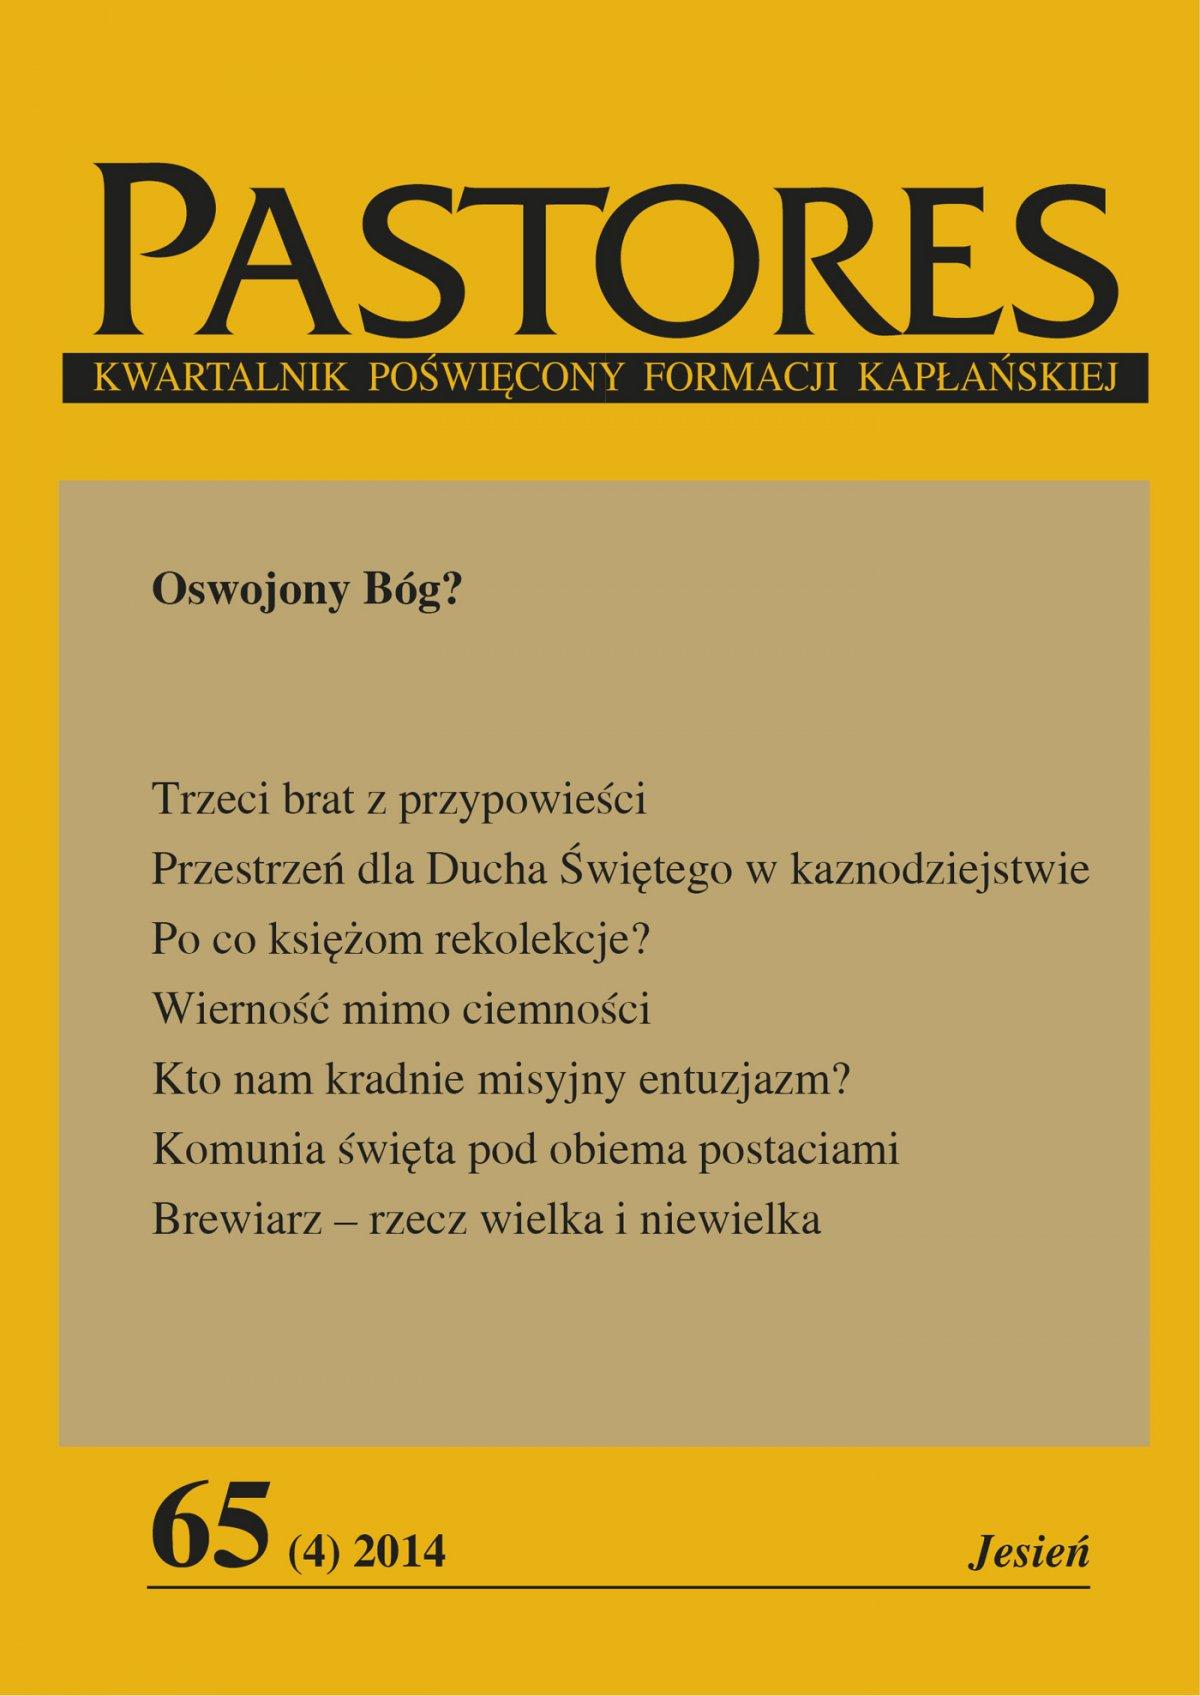 Pastores nr 65 - Ebook (Książka EPUB) do pobrania w formacie EPUB